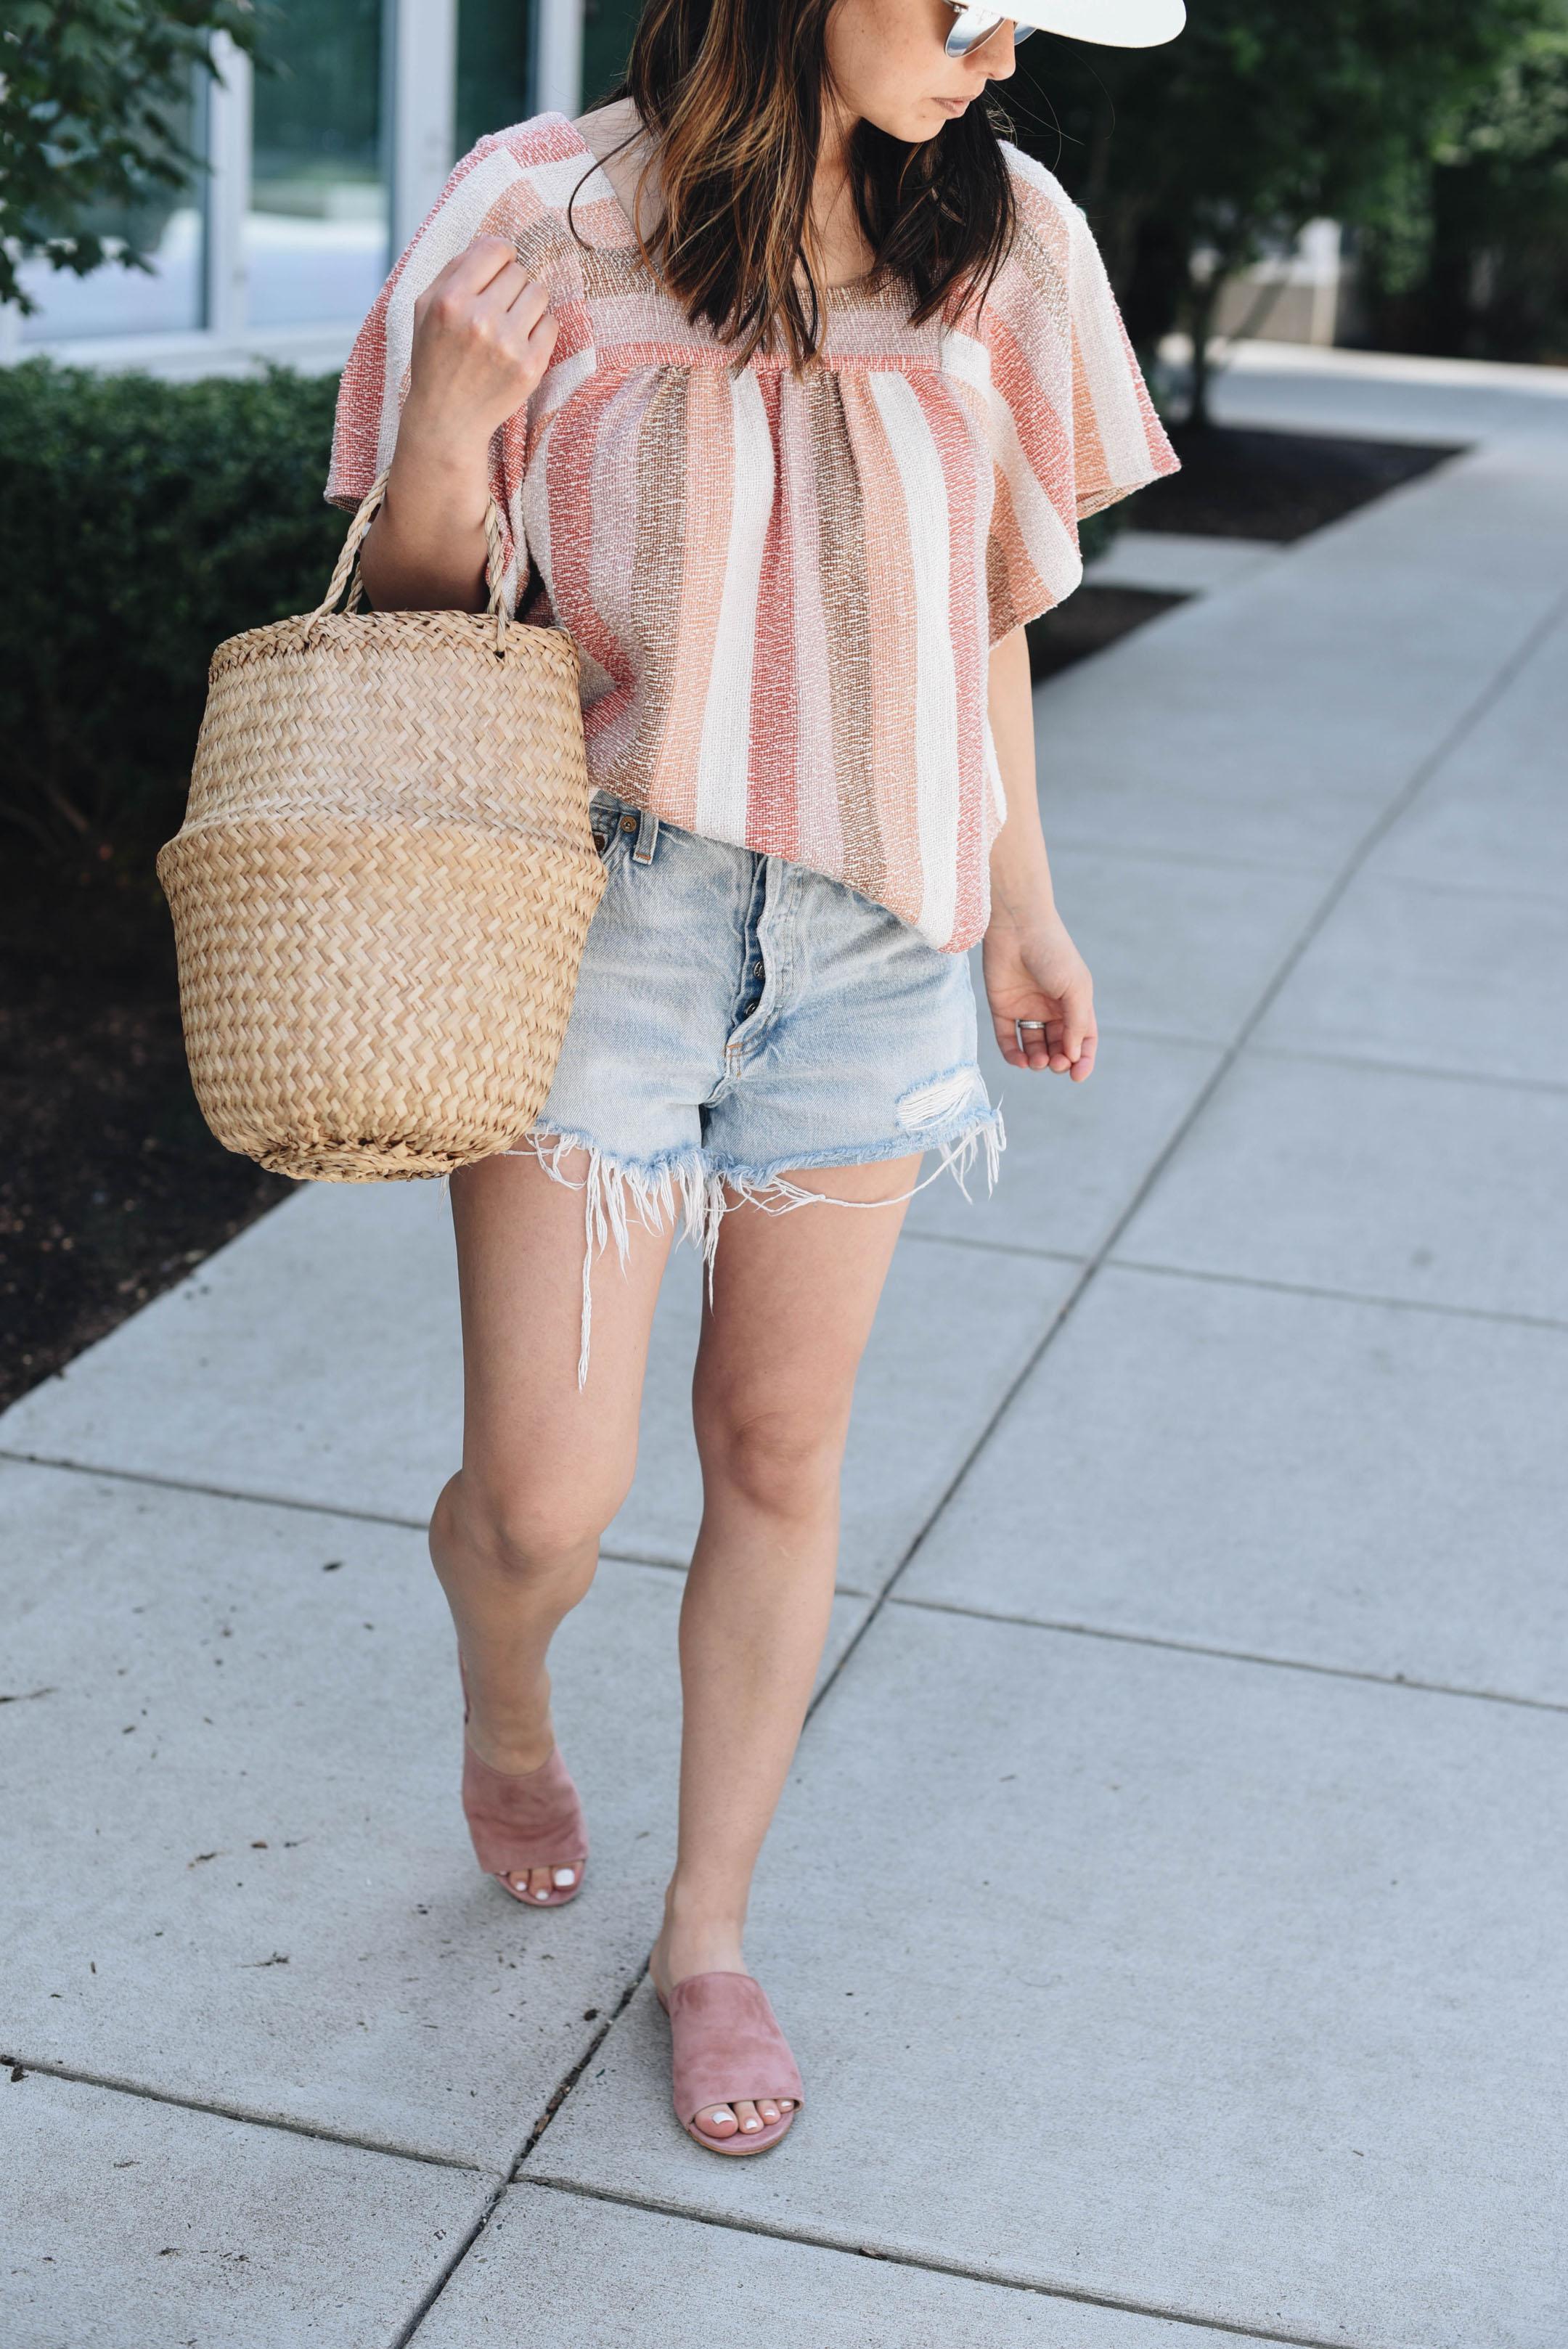 M.Gemi pink slide sandals